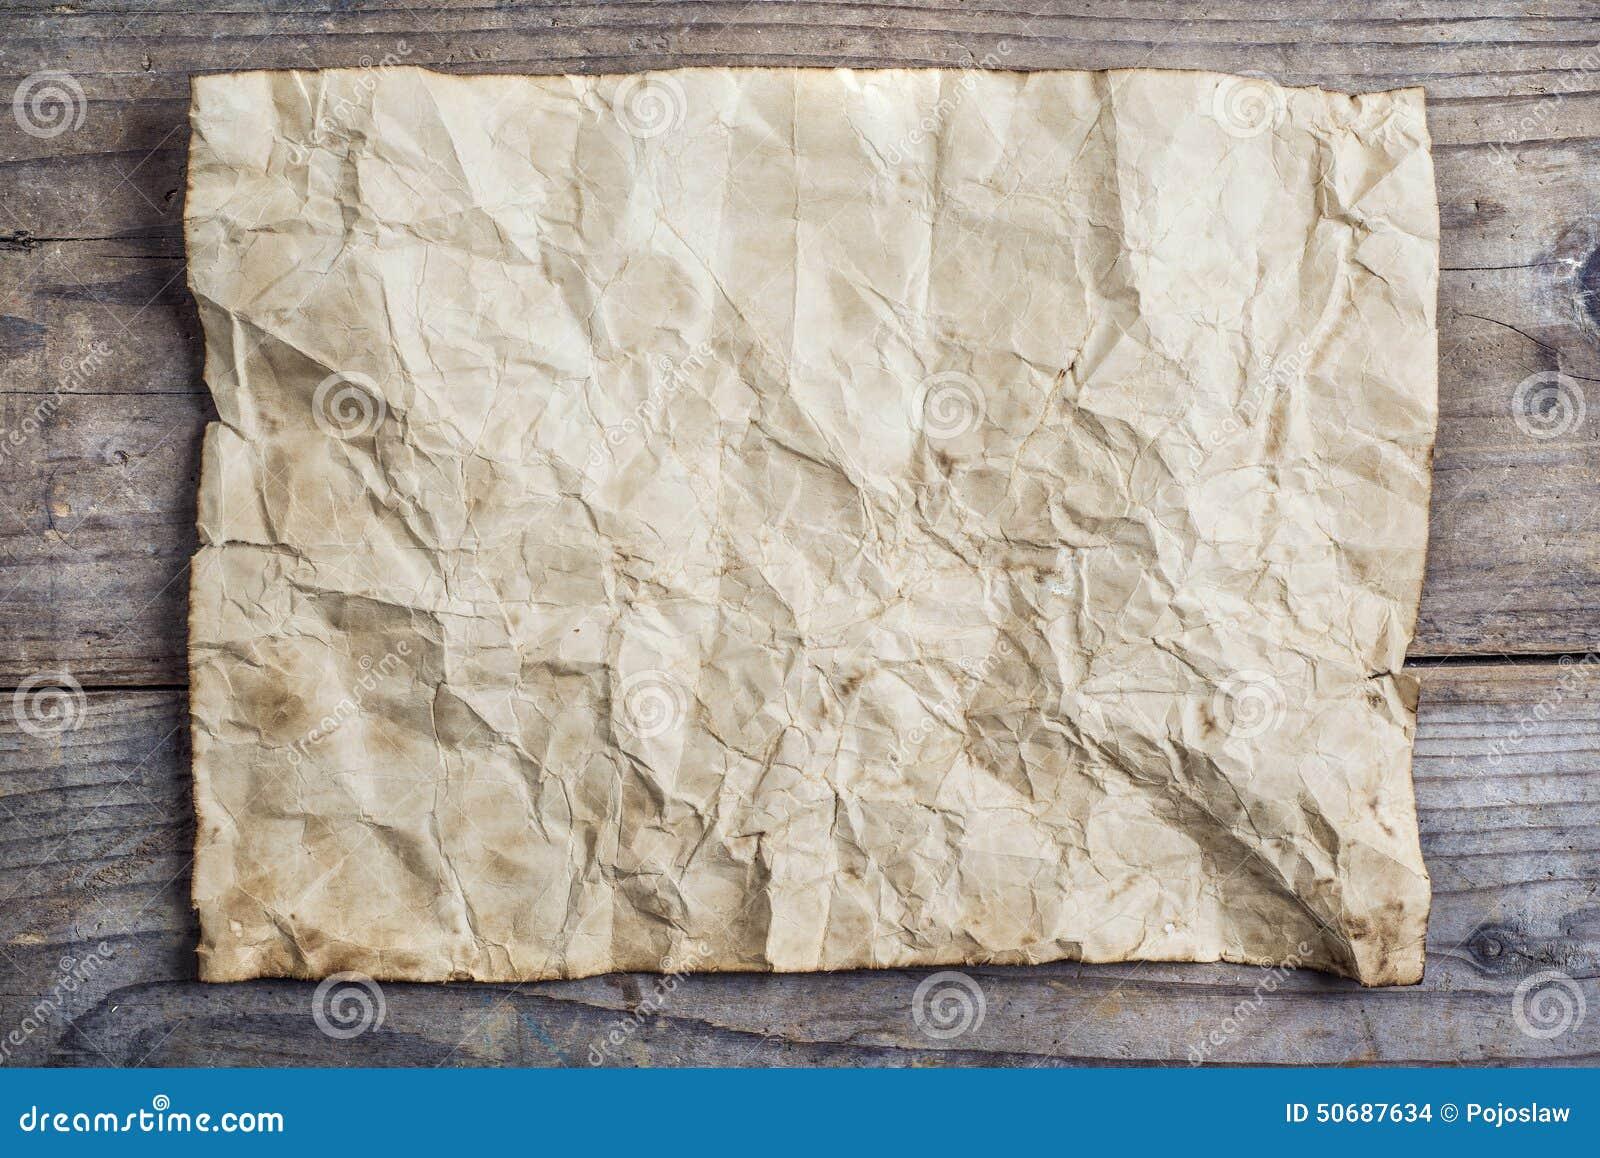 Download 背景接近的纸射击 库存照片. 图片 包括有 模式, 粗砺, 纹理, 详细资料, 折痕, 回收, 表面, 自然 - 50687634